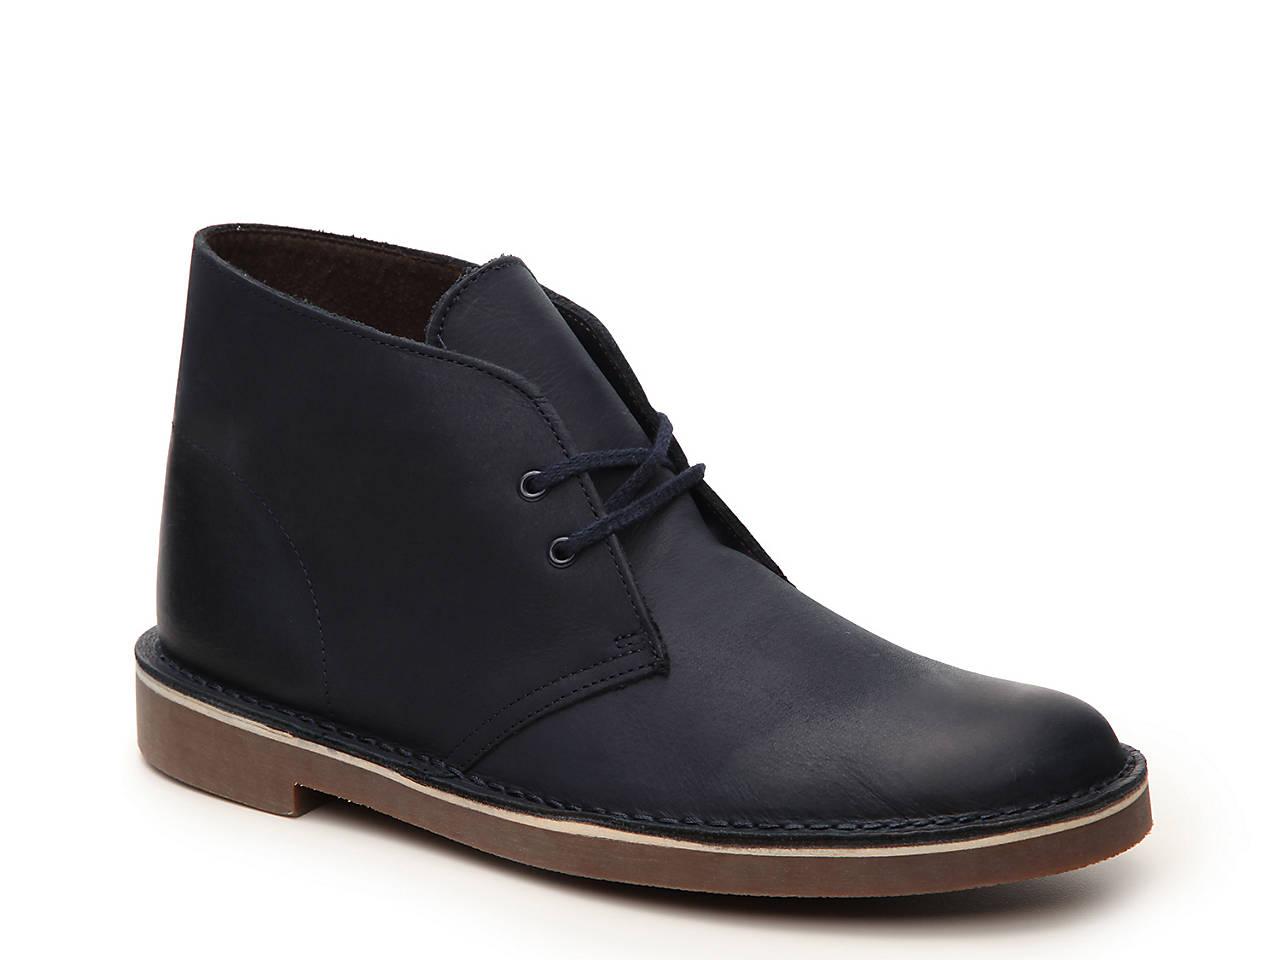 846a89489a1 Bushacre Leather Chukka Boot